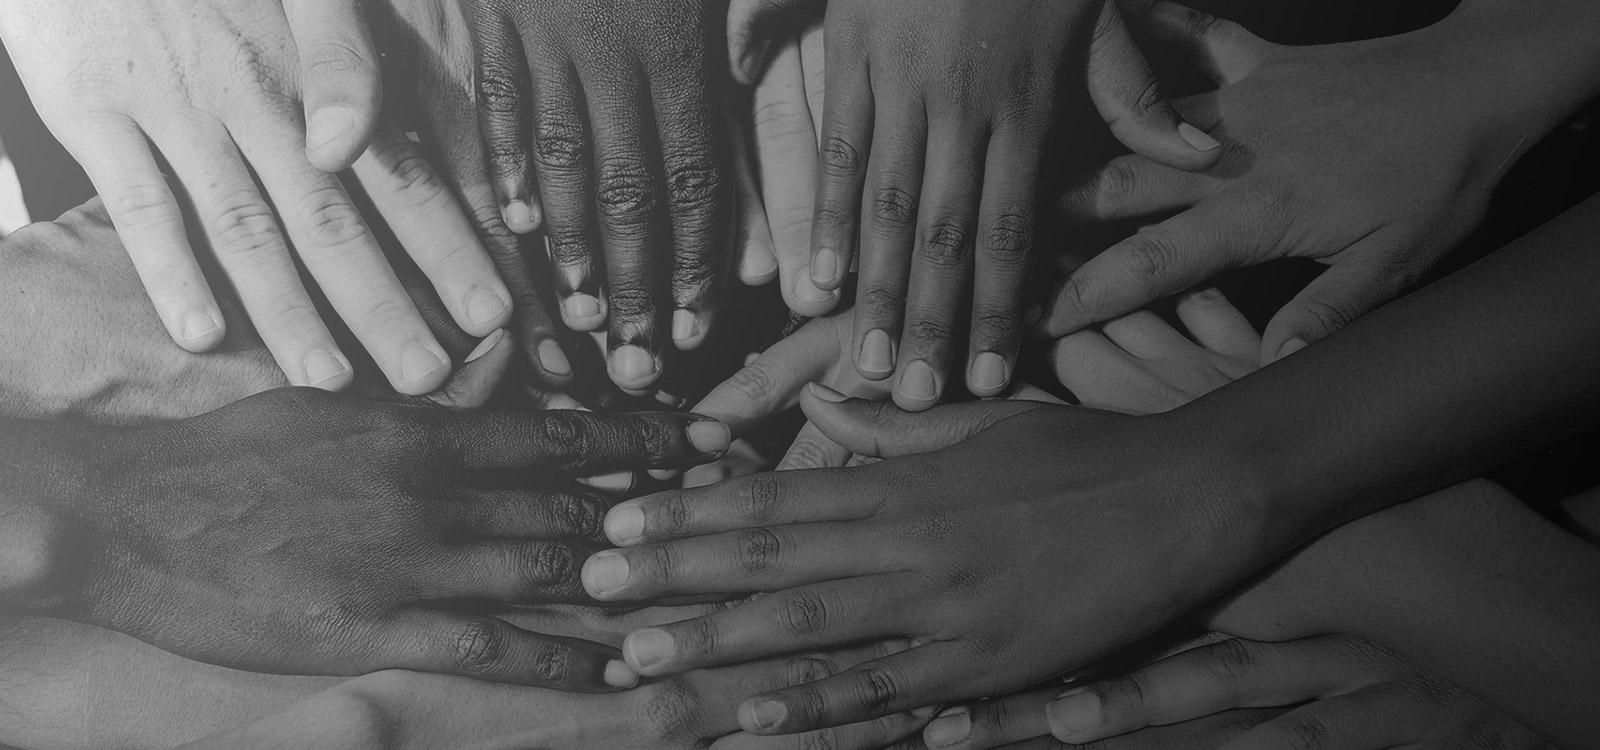 hands_of_change_mission1